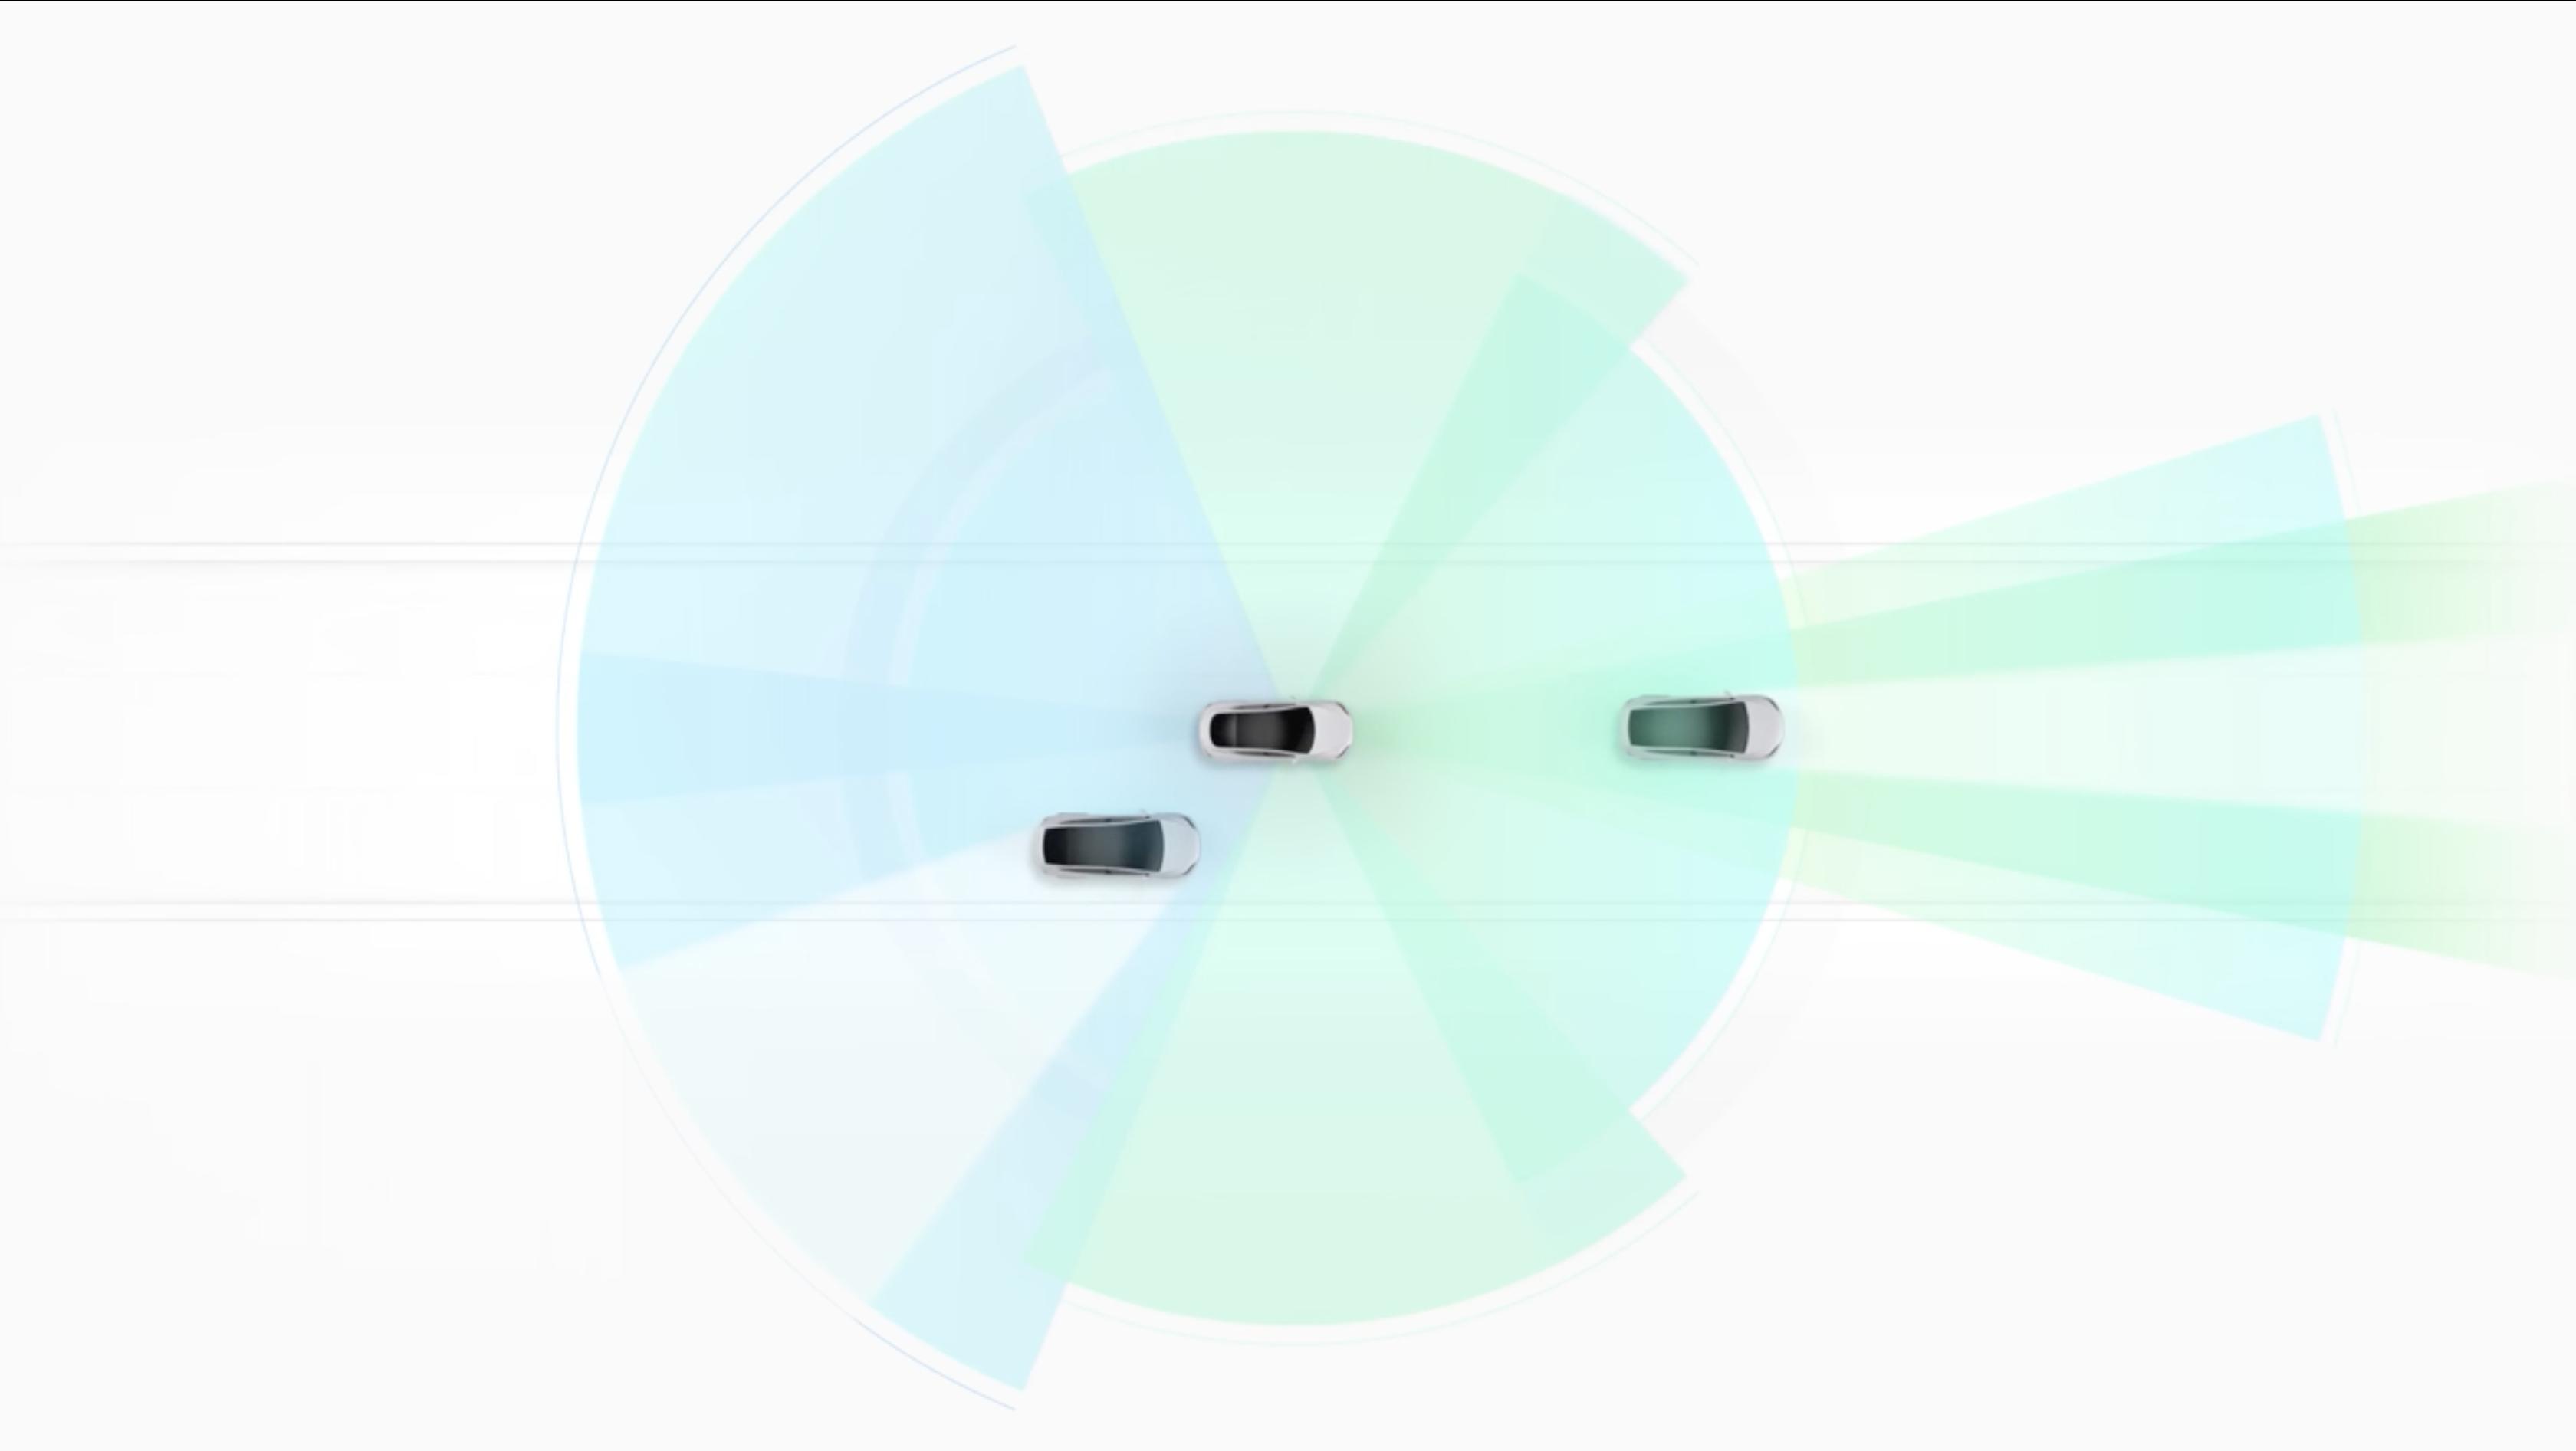 Tesla לבנה עם תיאור Autopilot צבעוני